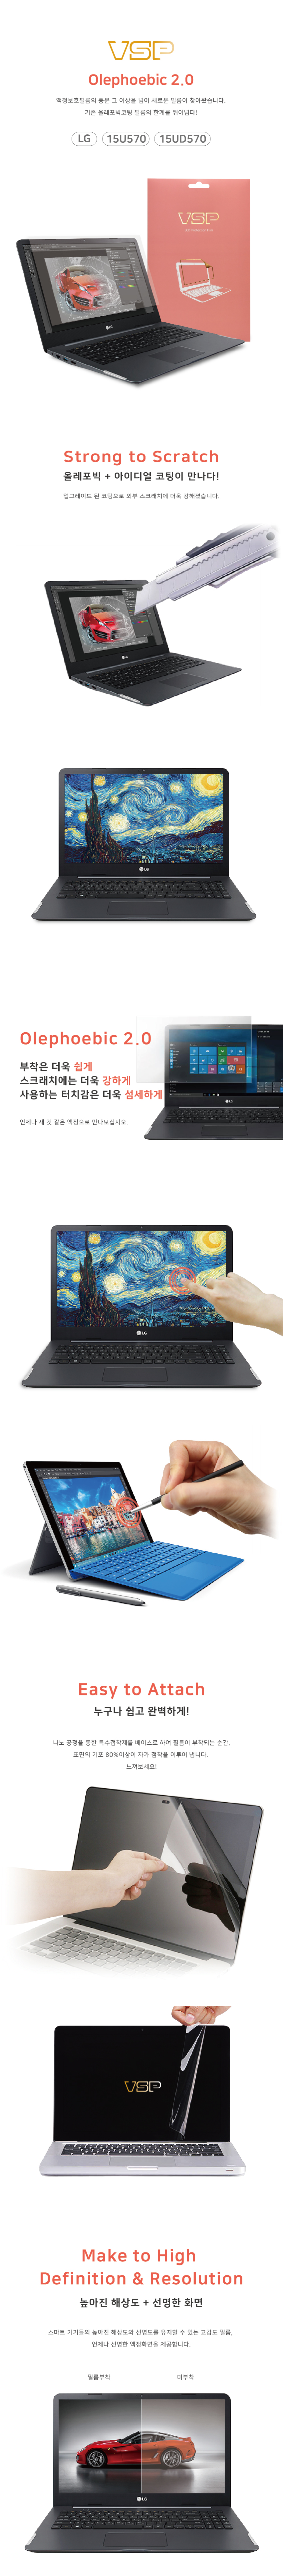 LG울트라PC 2017 LG 15U570 15UD570 올레포빅 액정 보호필름 - 뷰에스피, 21,250원, 노트북 액정보호필름, 14~15인치